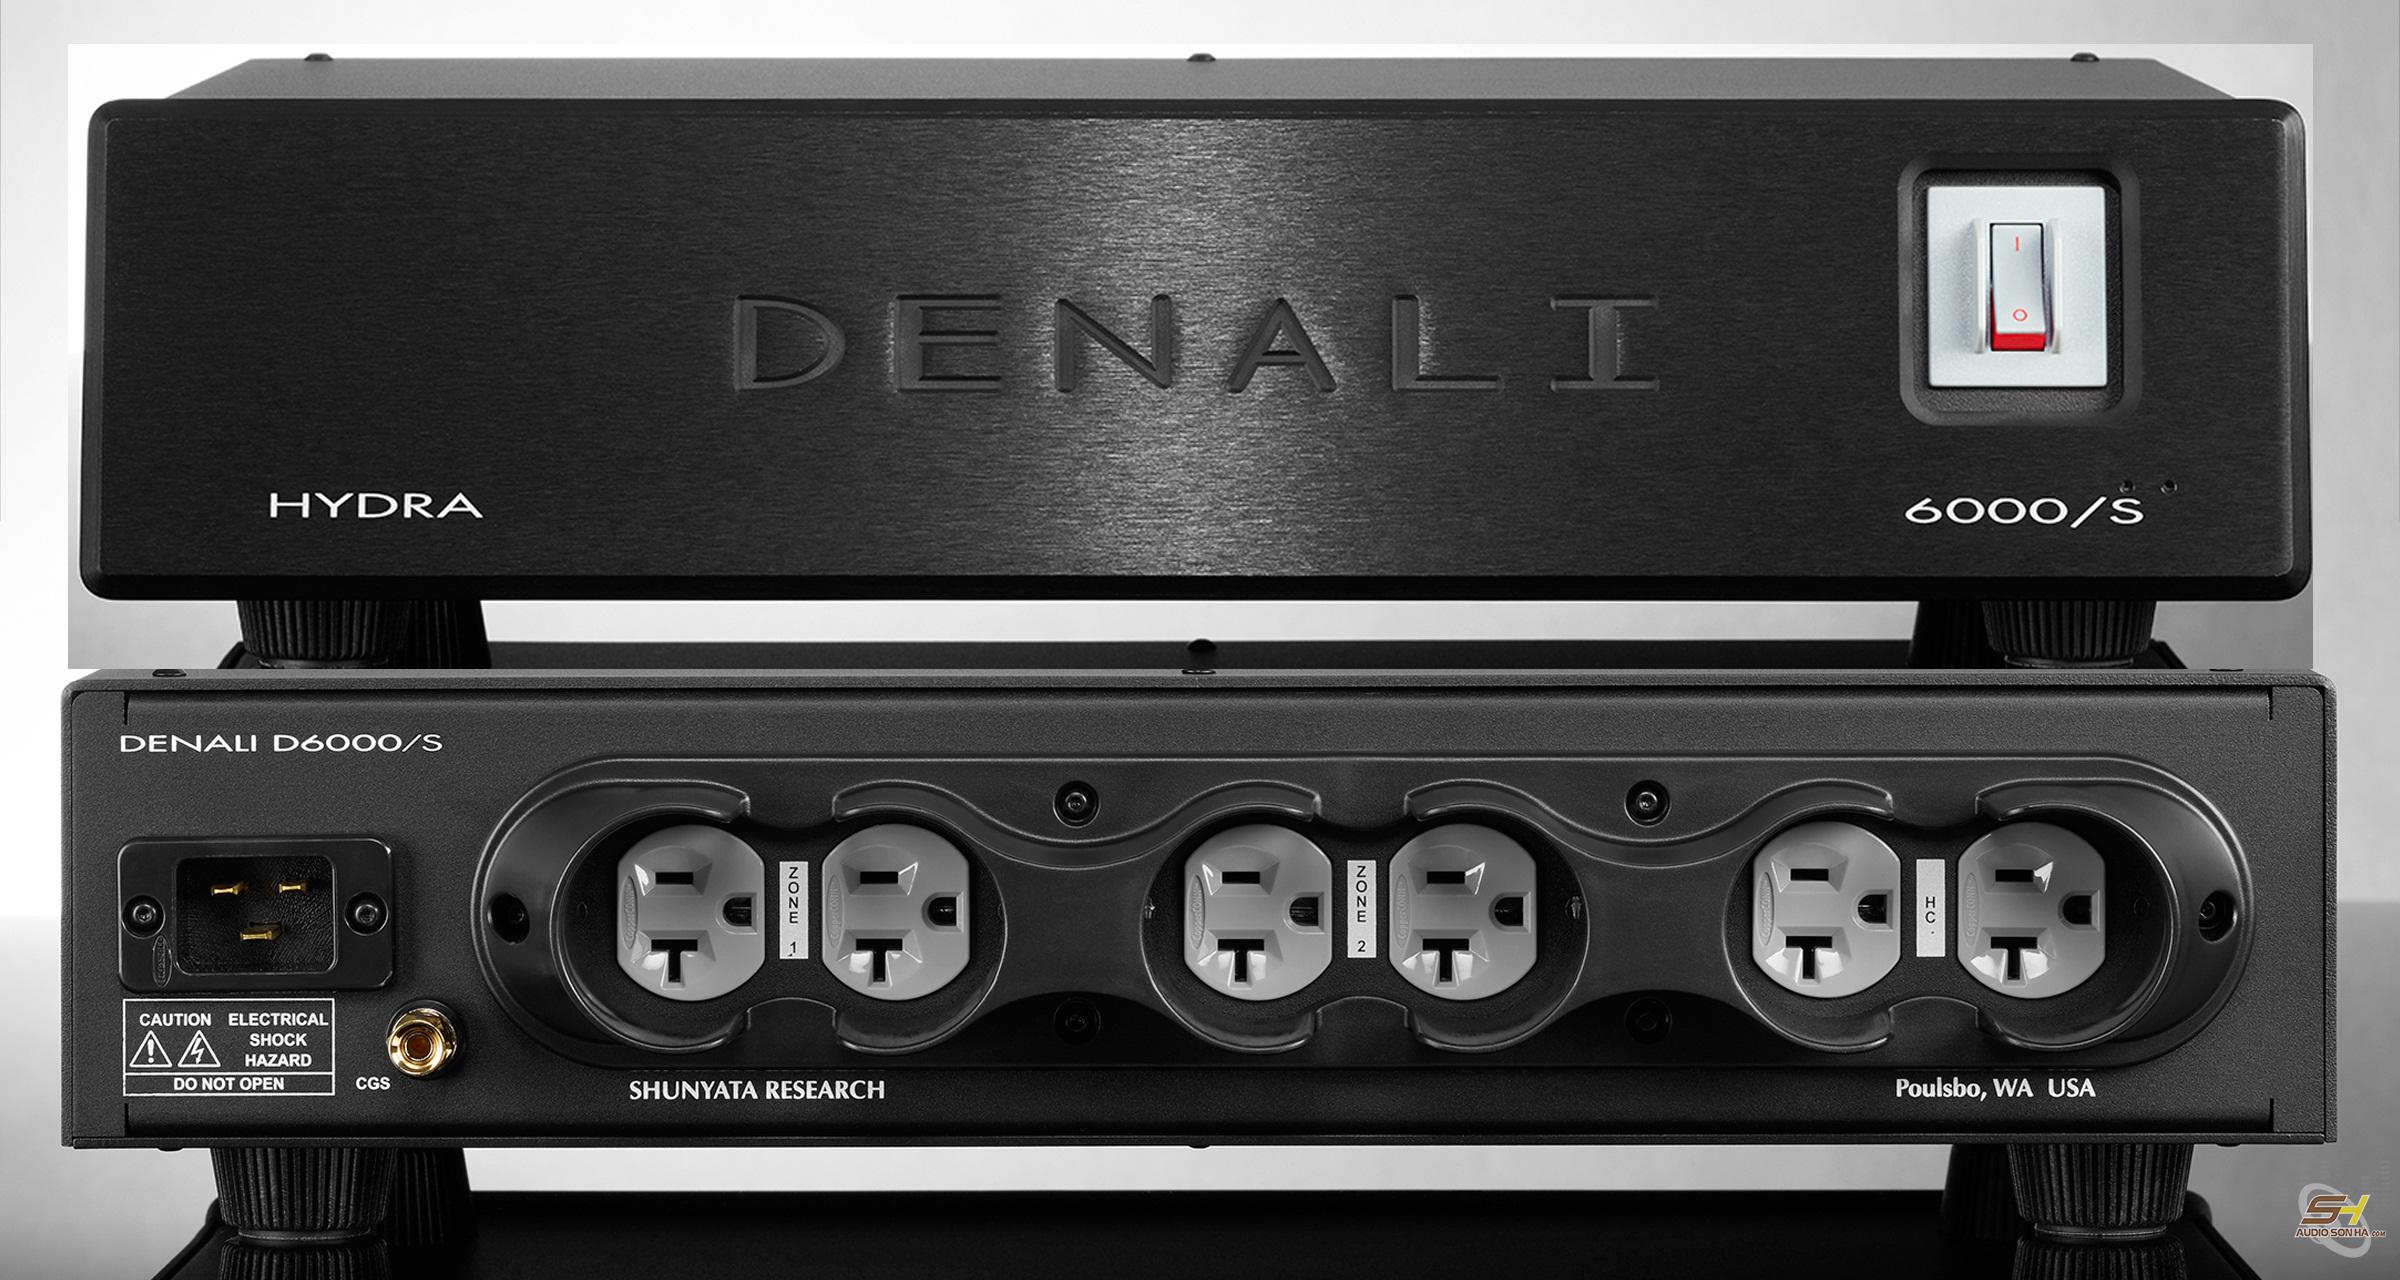 Shunyata DENALI D6000/S 240V 6 Outlets